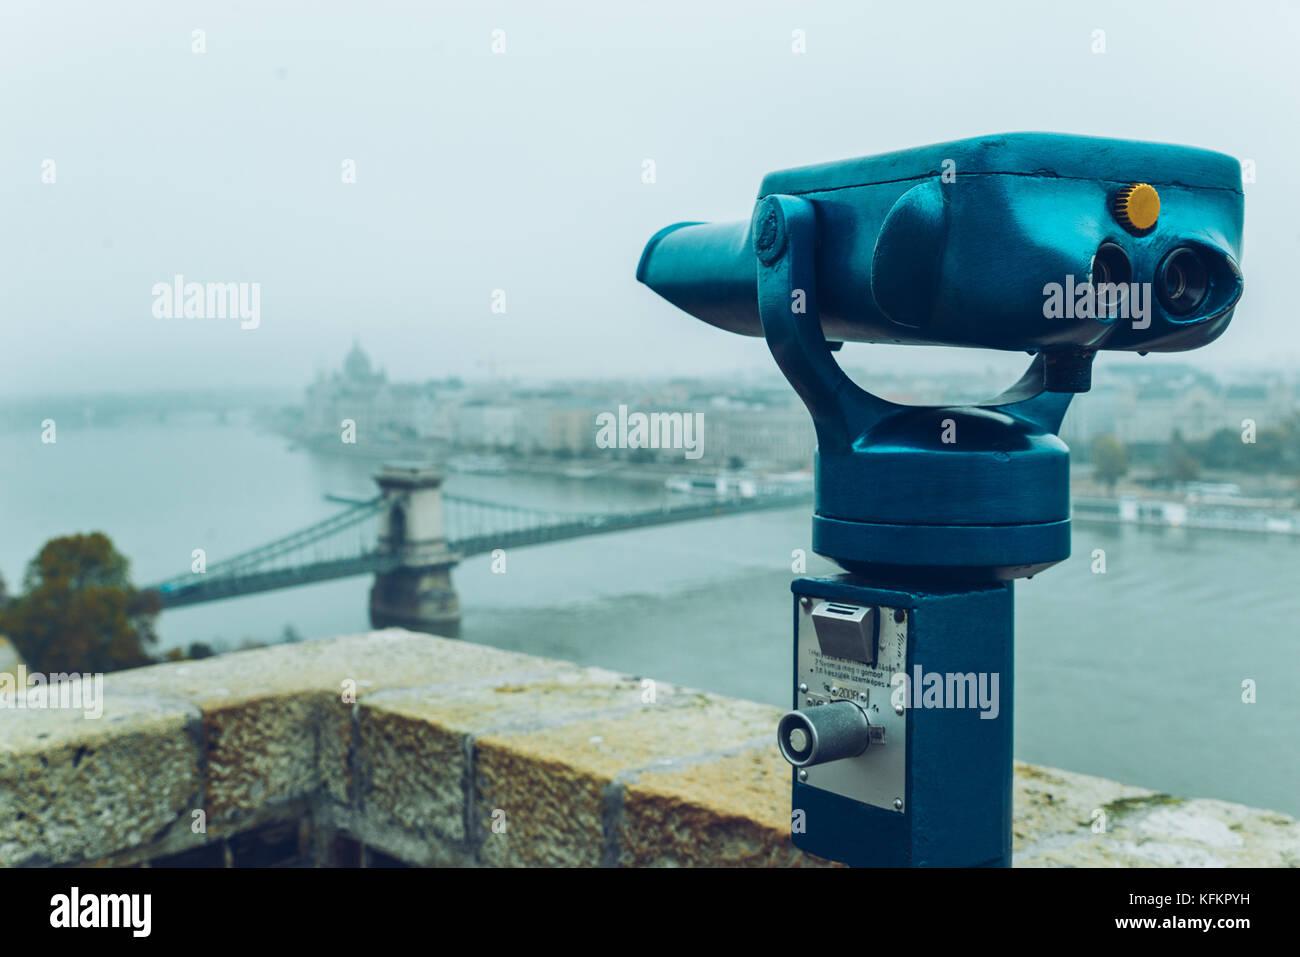 Binocular against observation deck view. - Stock Image